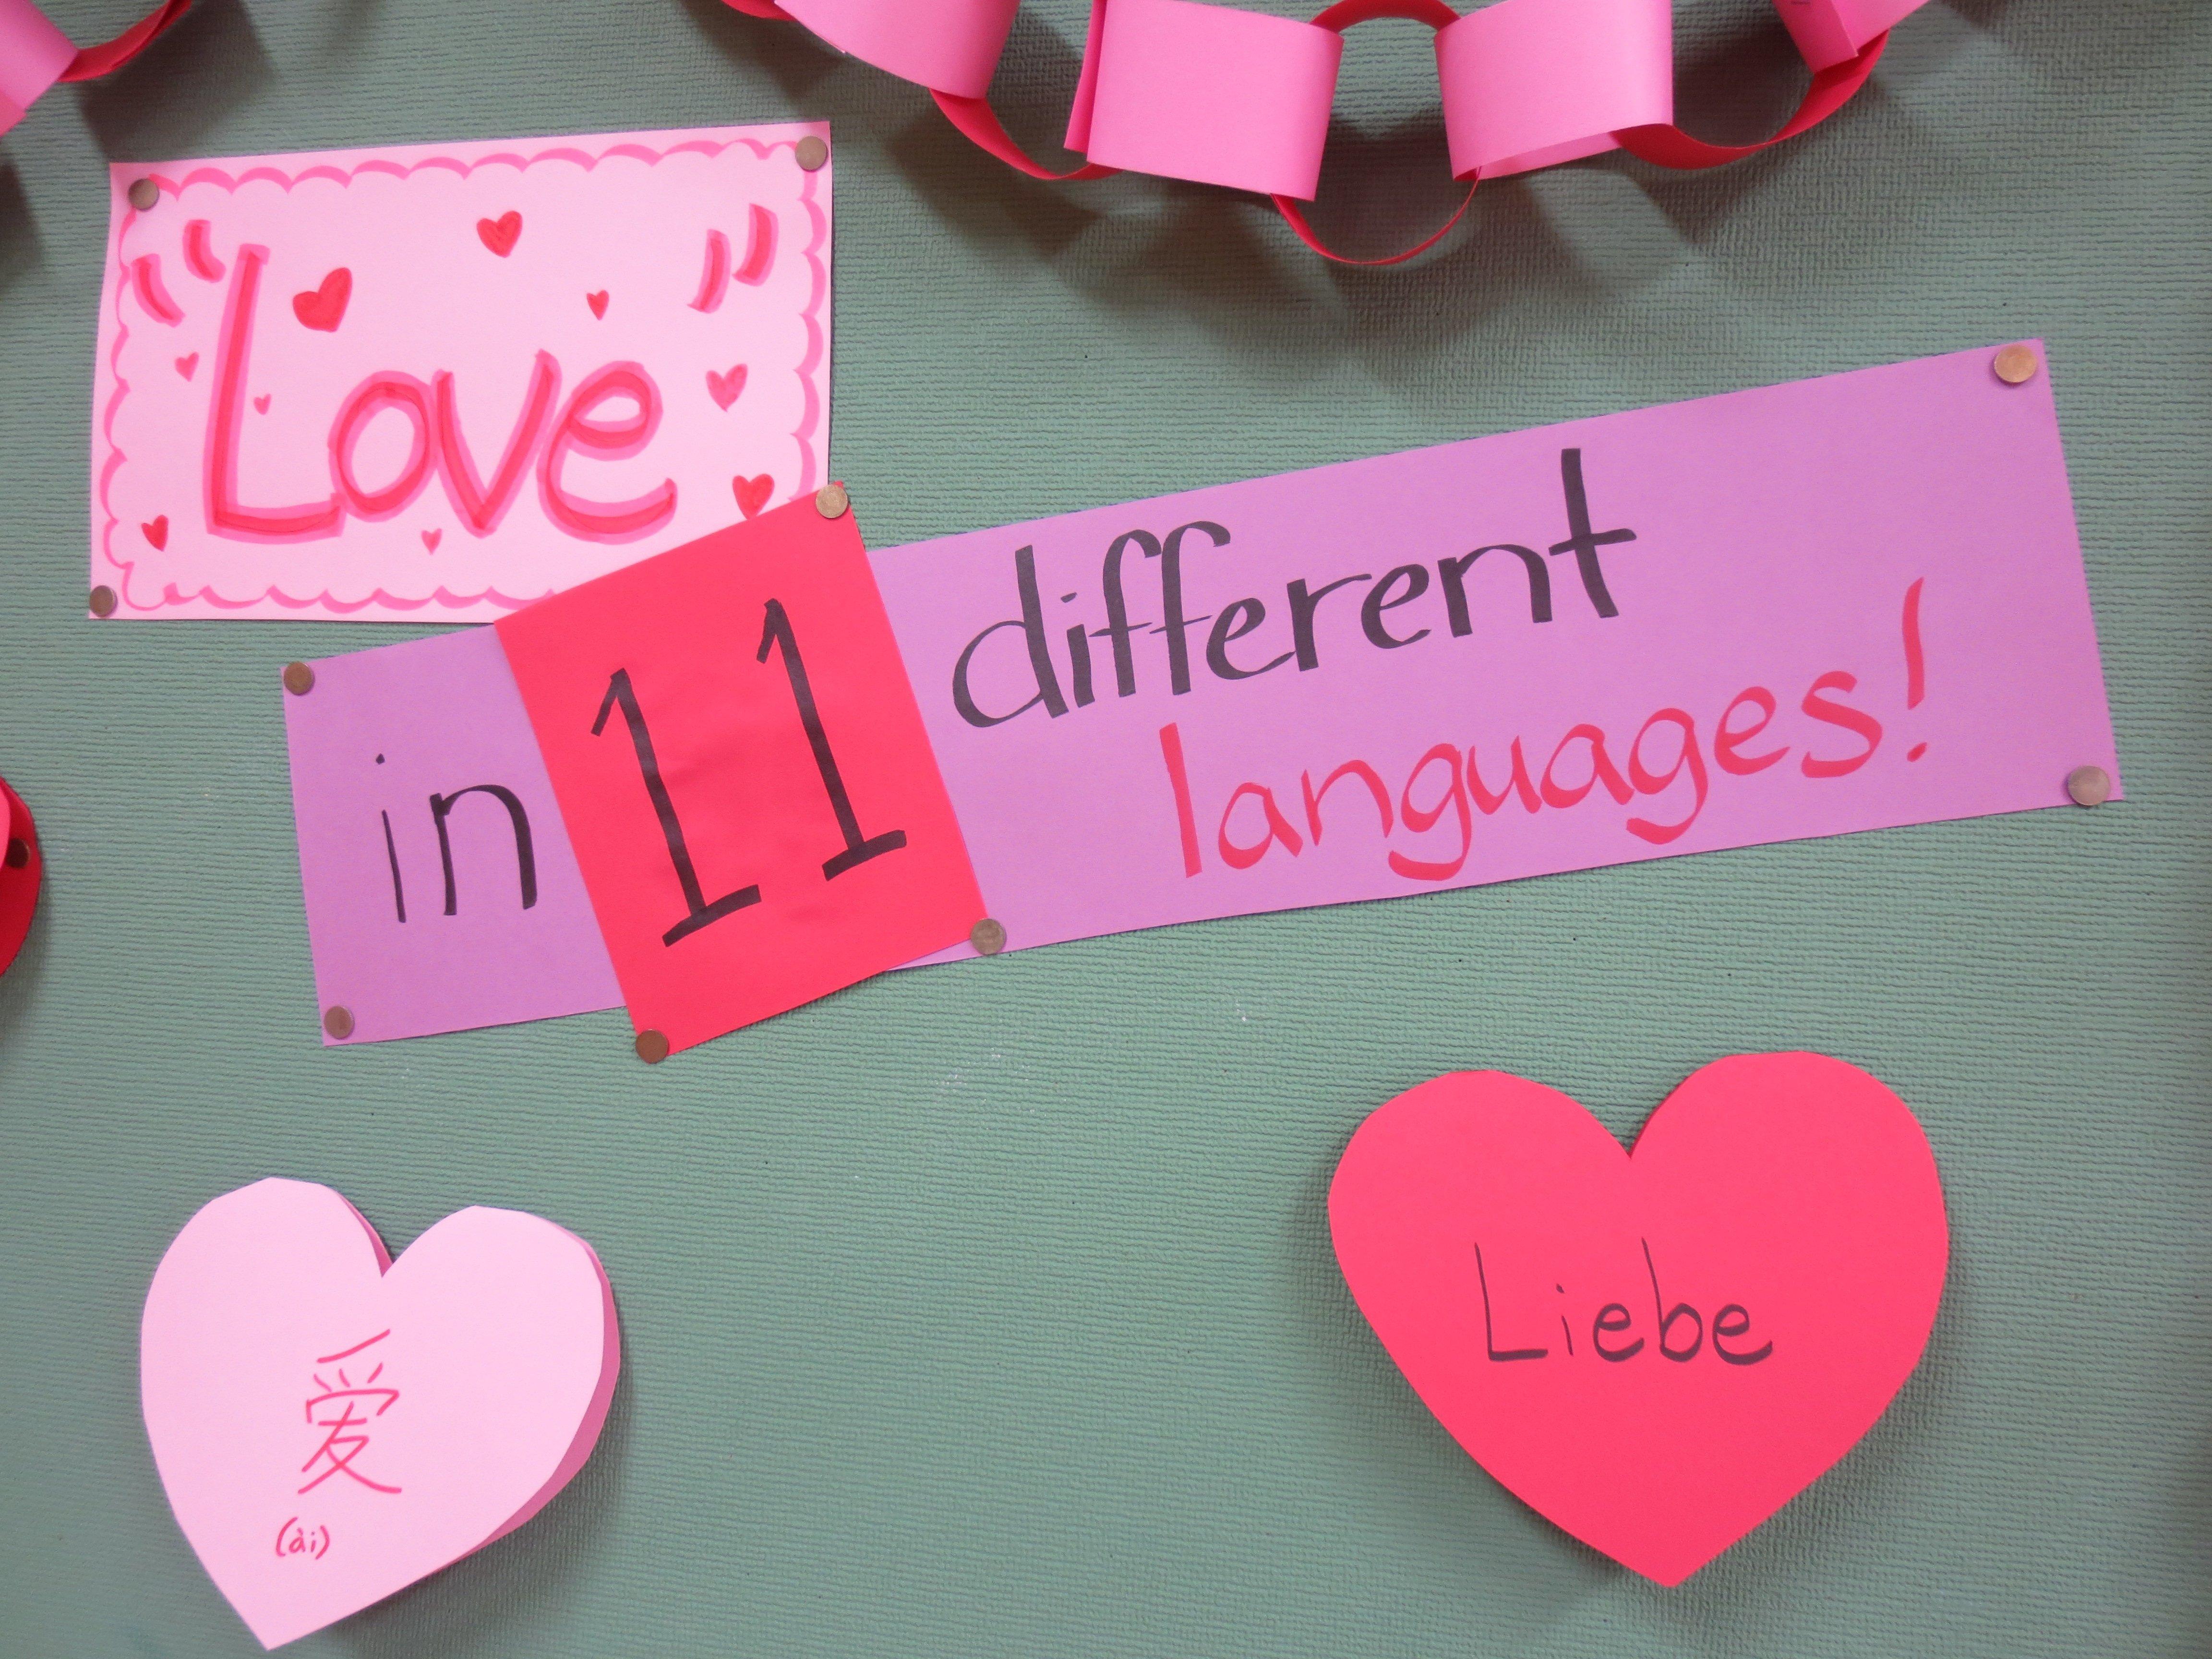 10 Ideal High School Valentines Day Ideas valentines day bulletin board ii e7b4a0e695b5e381aae383a9e382a4e38395 3 2020